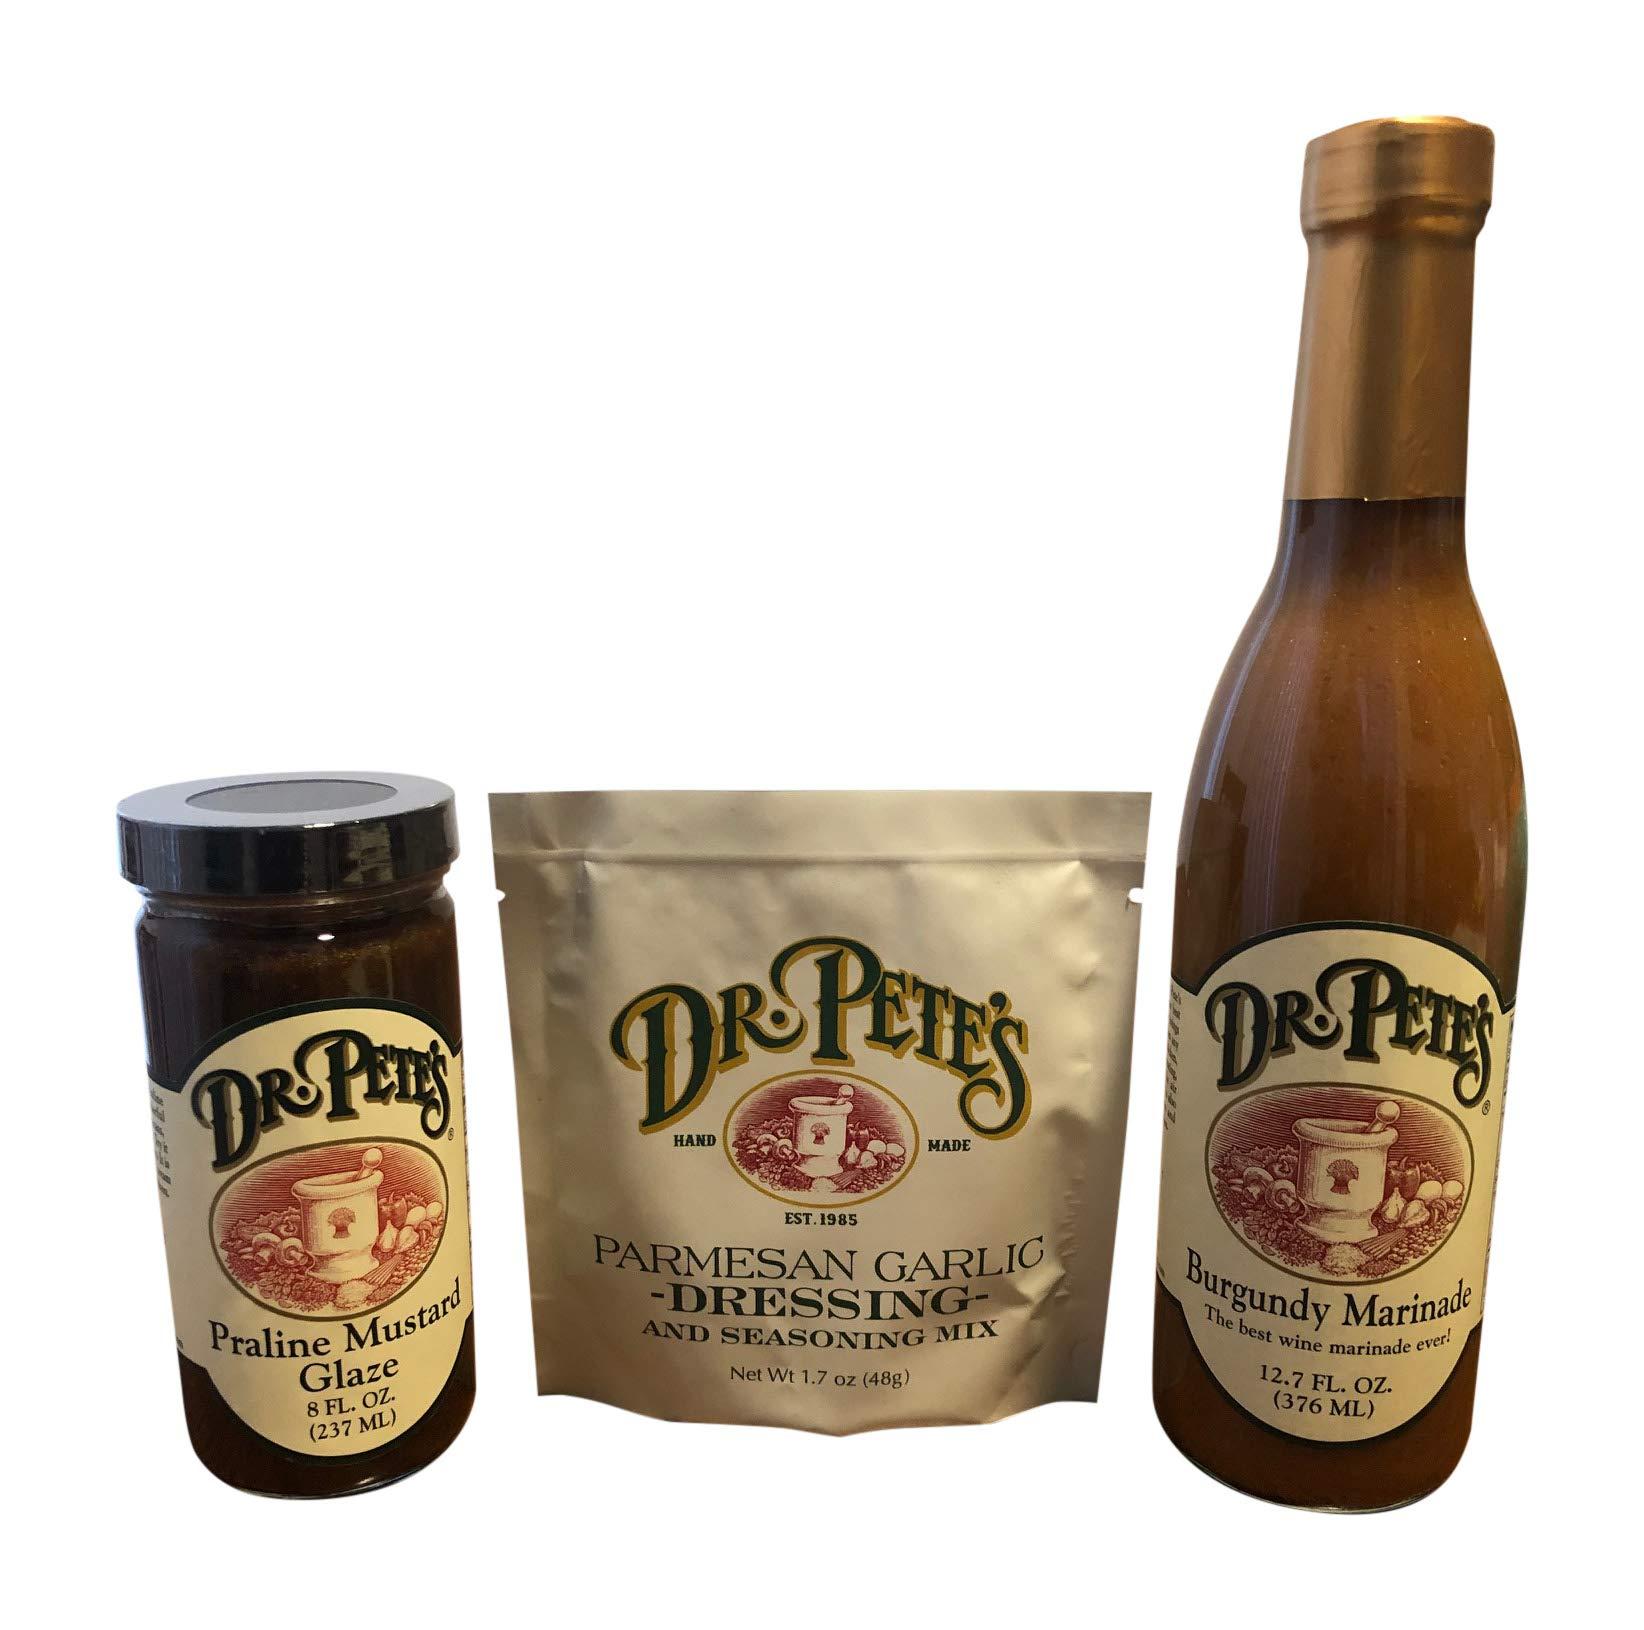 Dr. Pete's Burgundy Marinade, Praline Mustard Glaze, and Parmesan Garlic Dressing.